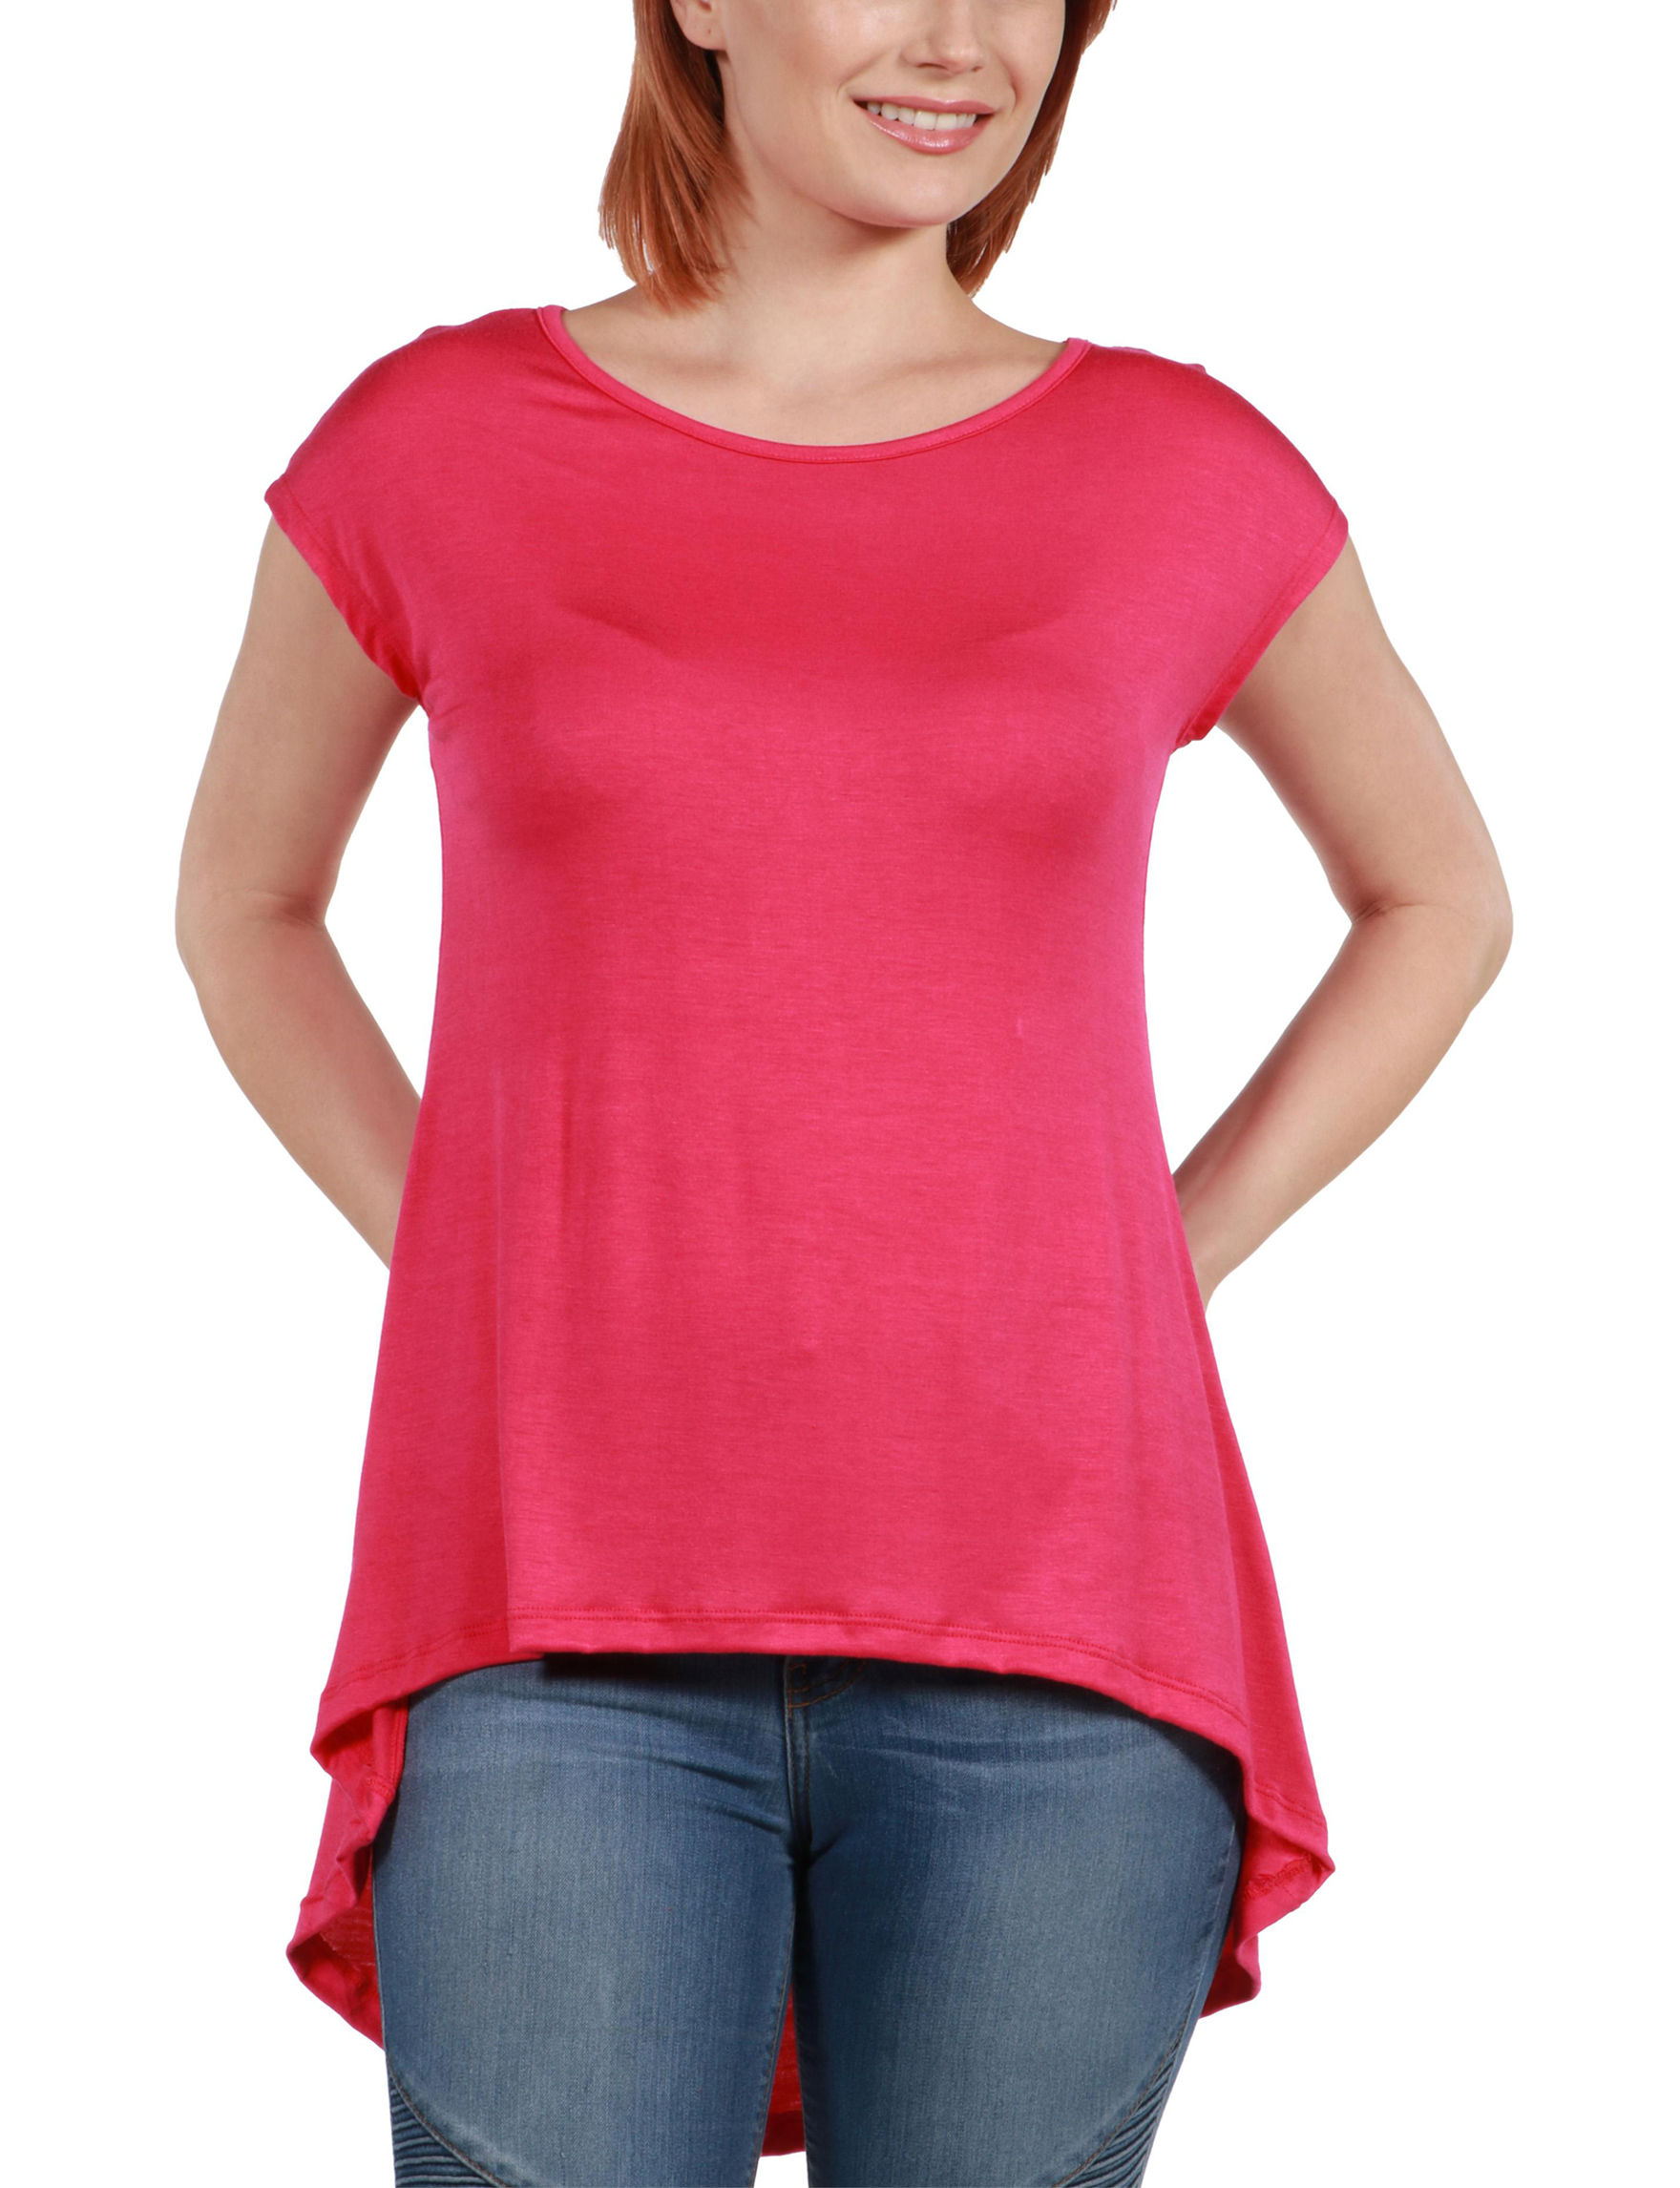 24Seven Comfort Apparel Pink